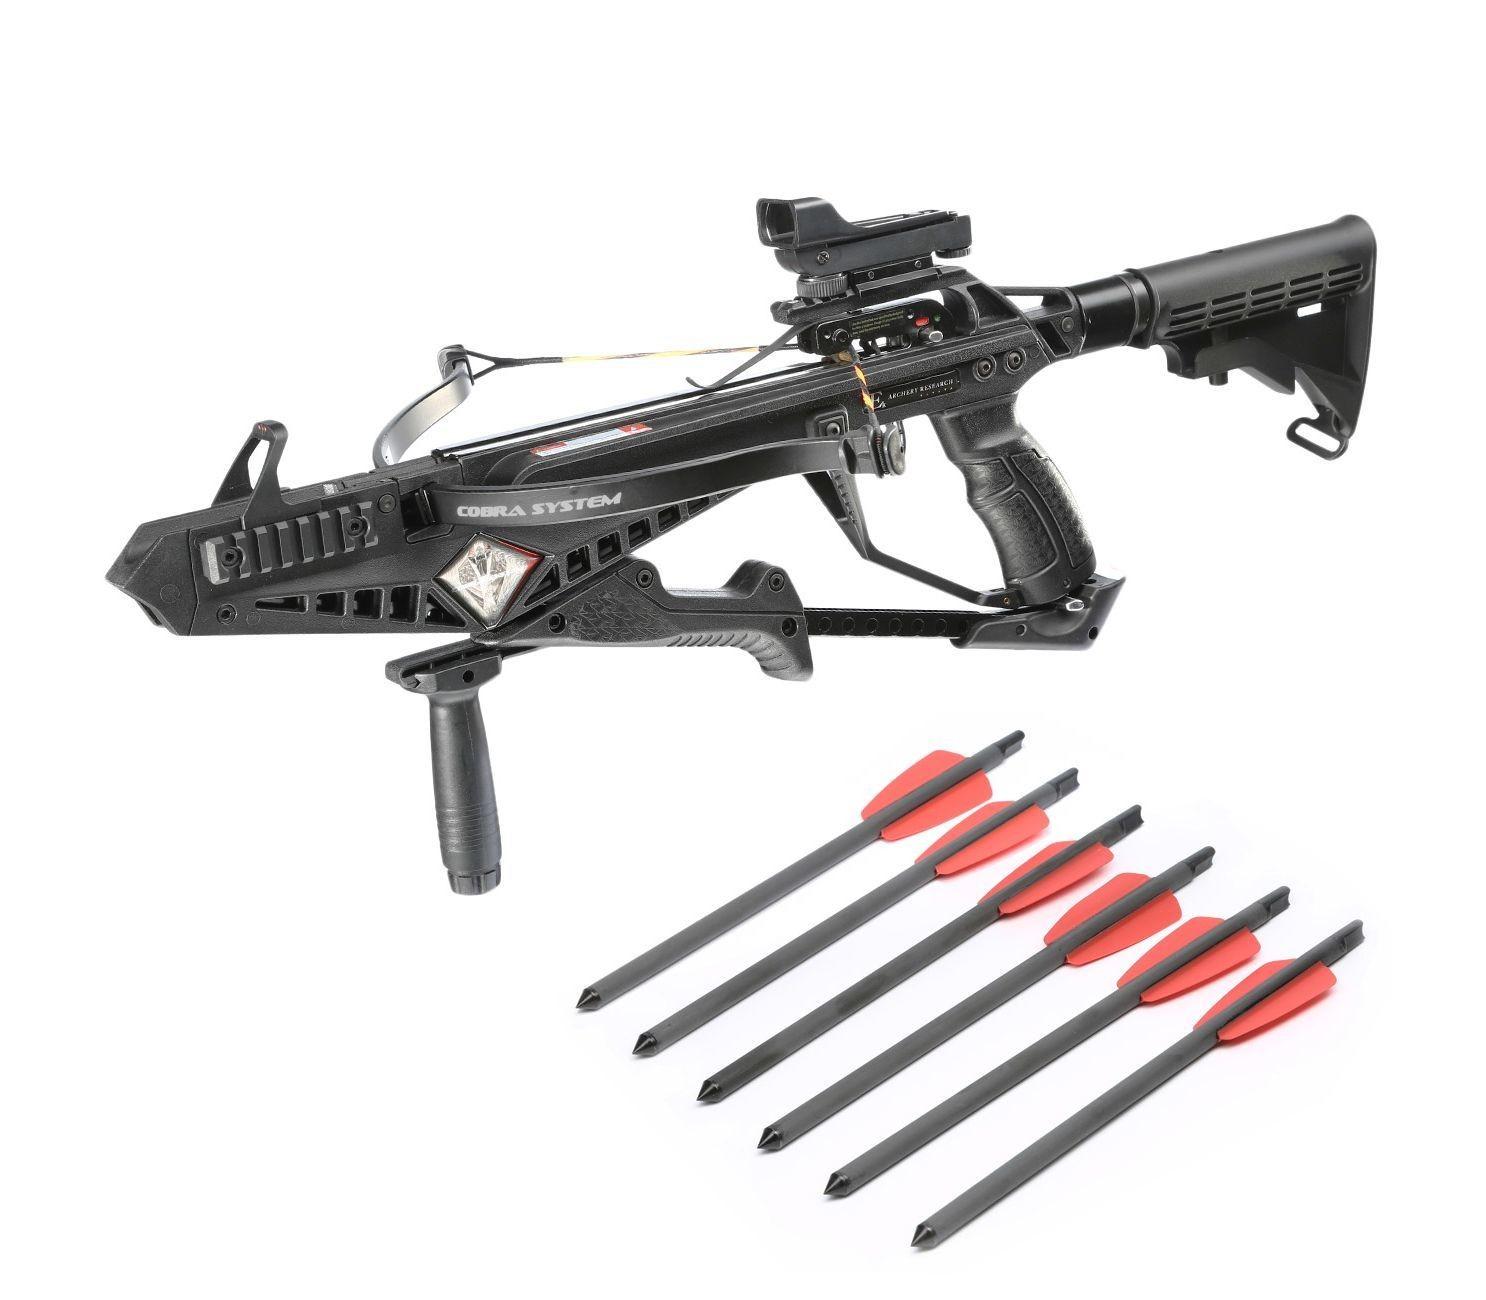 Арбалет-пистолет Ek Cobra System R9 Deluxe